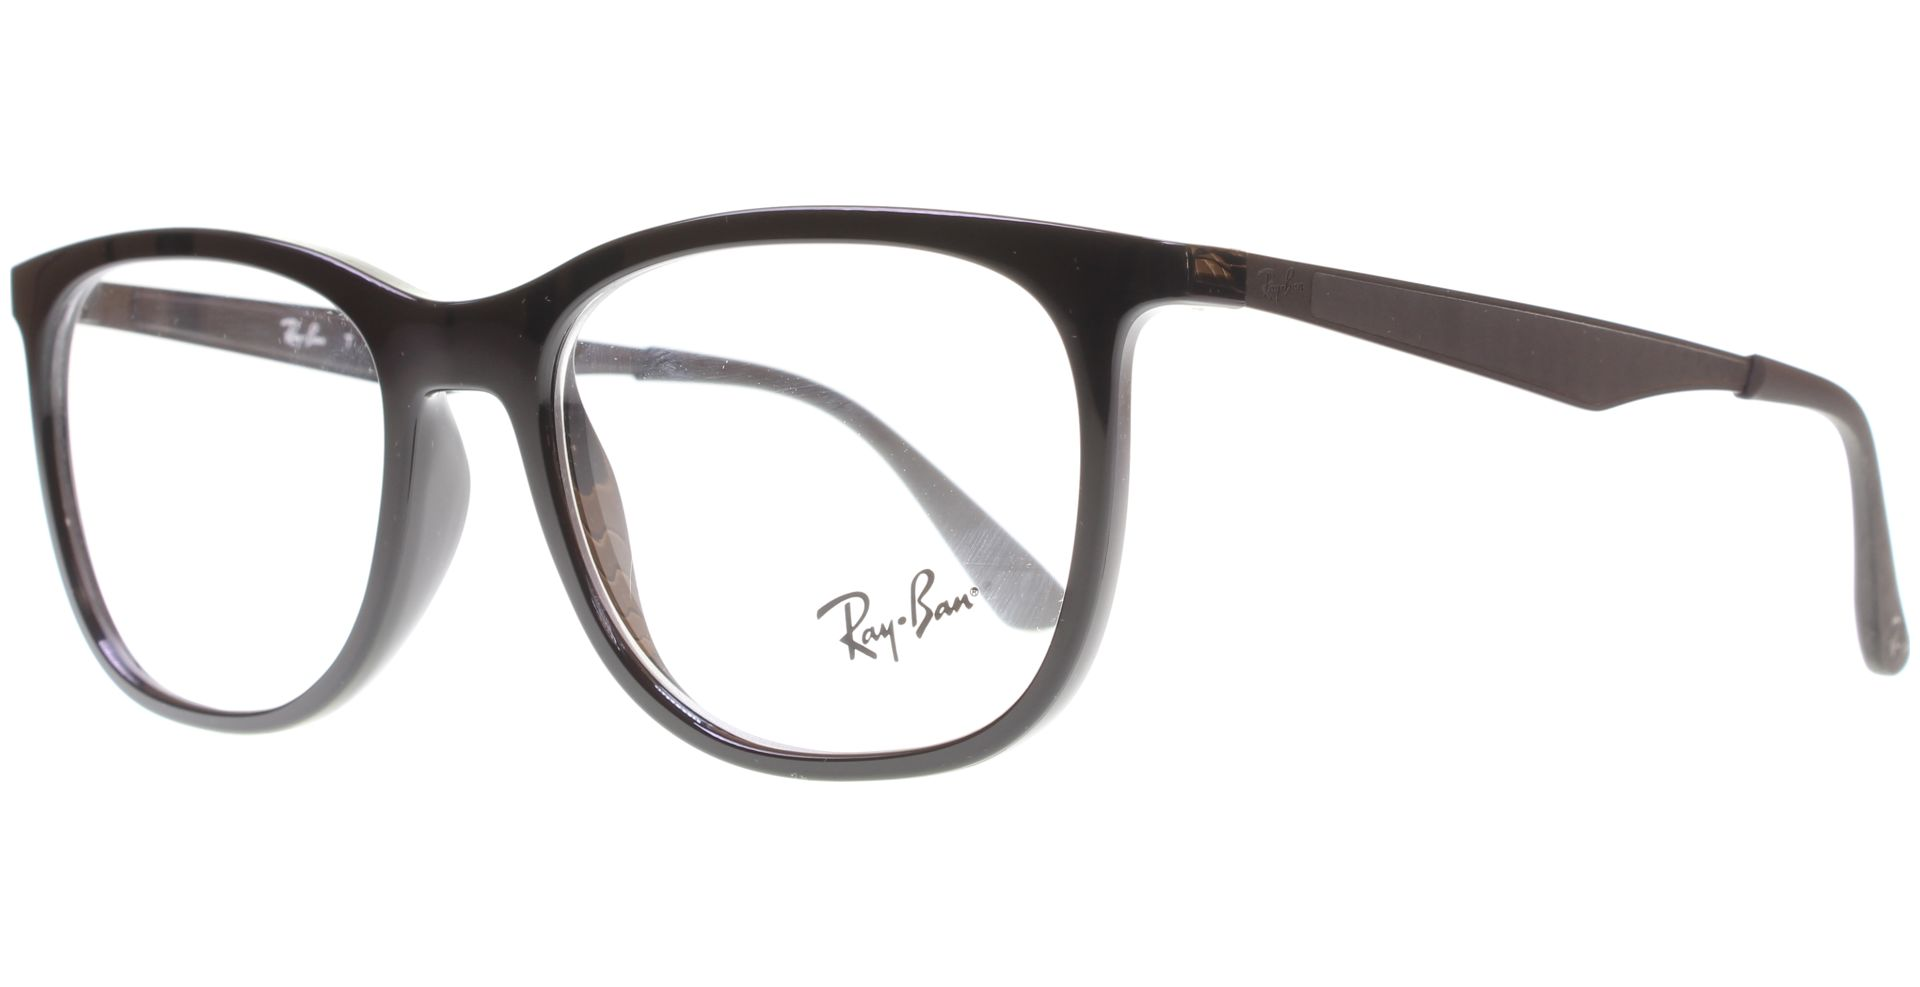 e291c65292 Ray-Ban - RB7078 2000 5318 Shiny Black - von Lensbest